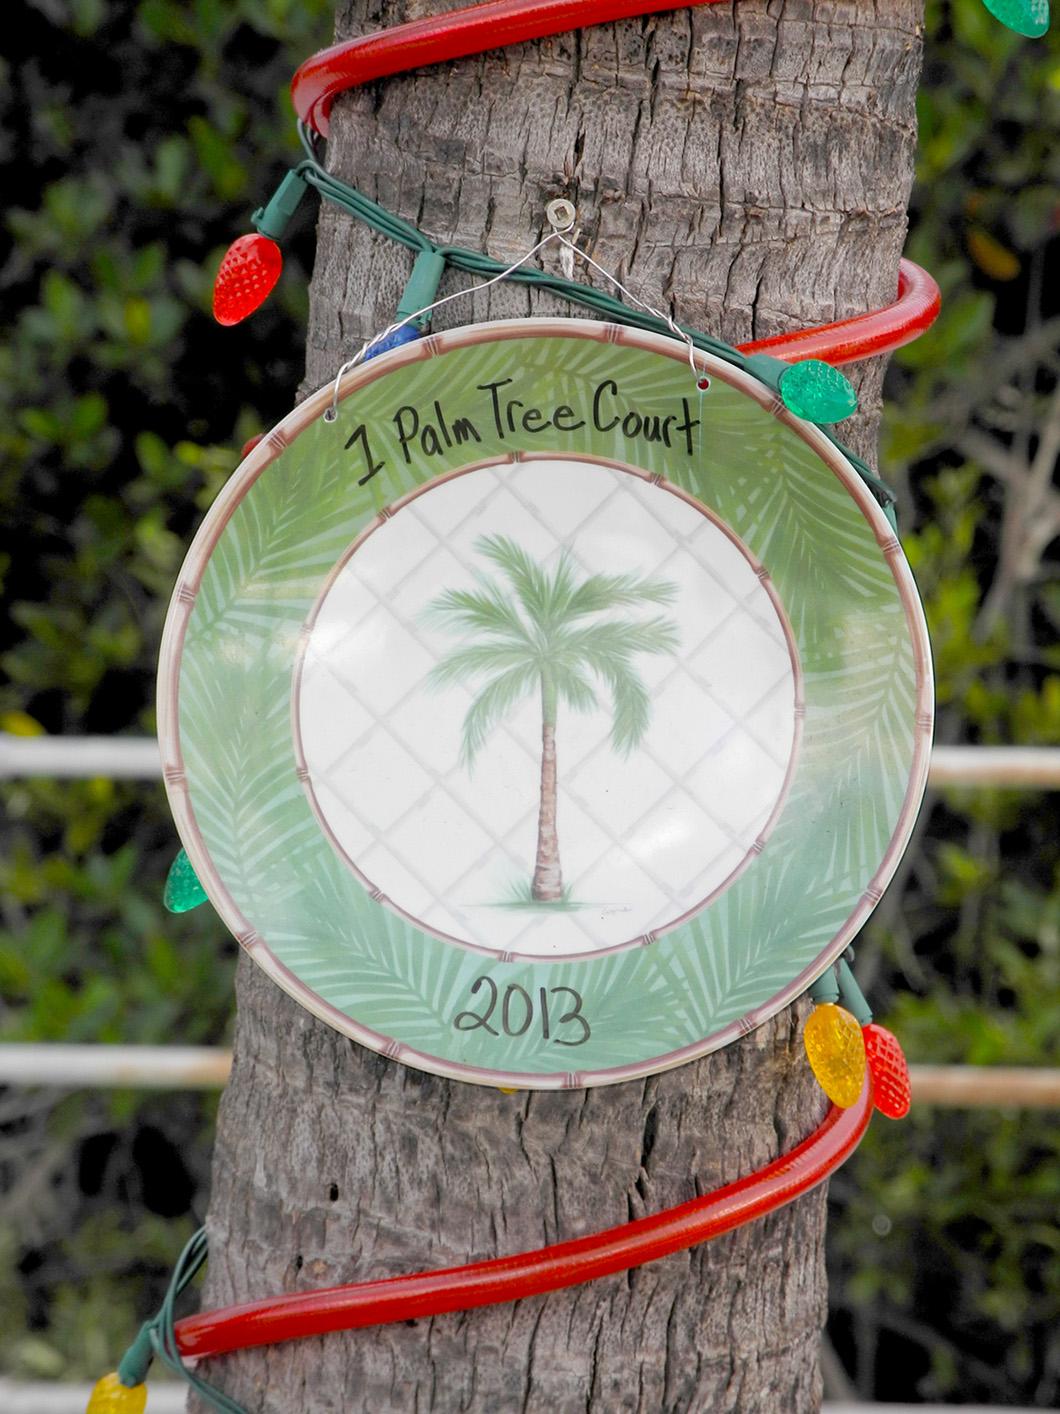 One Palm Tree Court